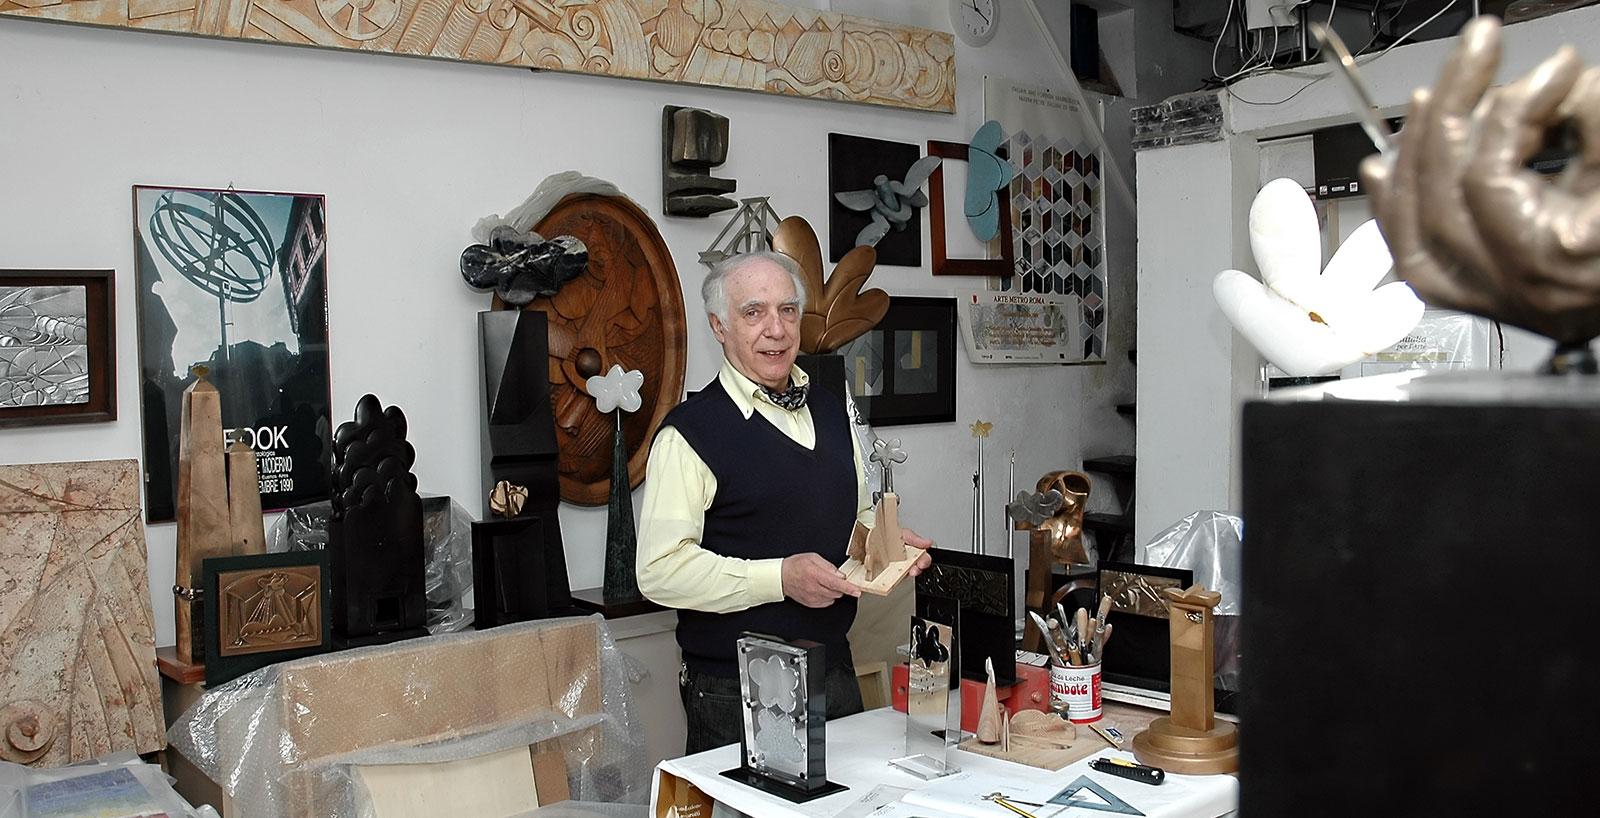 Federico Brook - Artista - Scultore